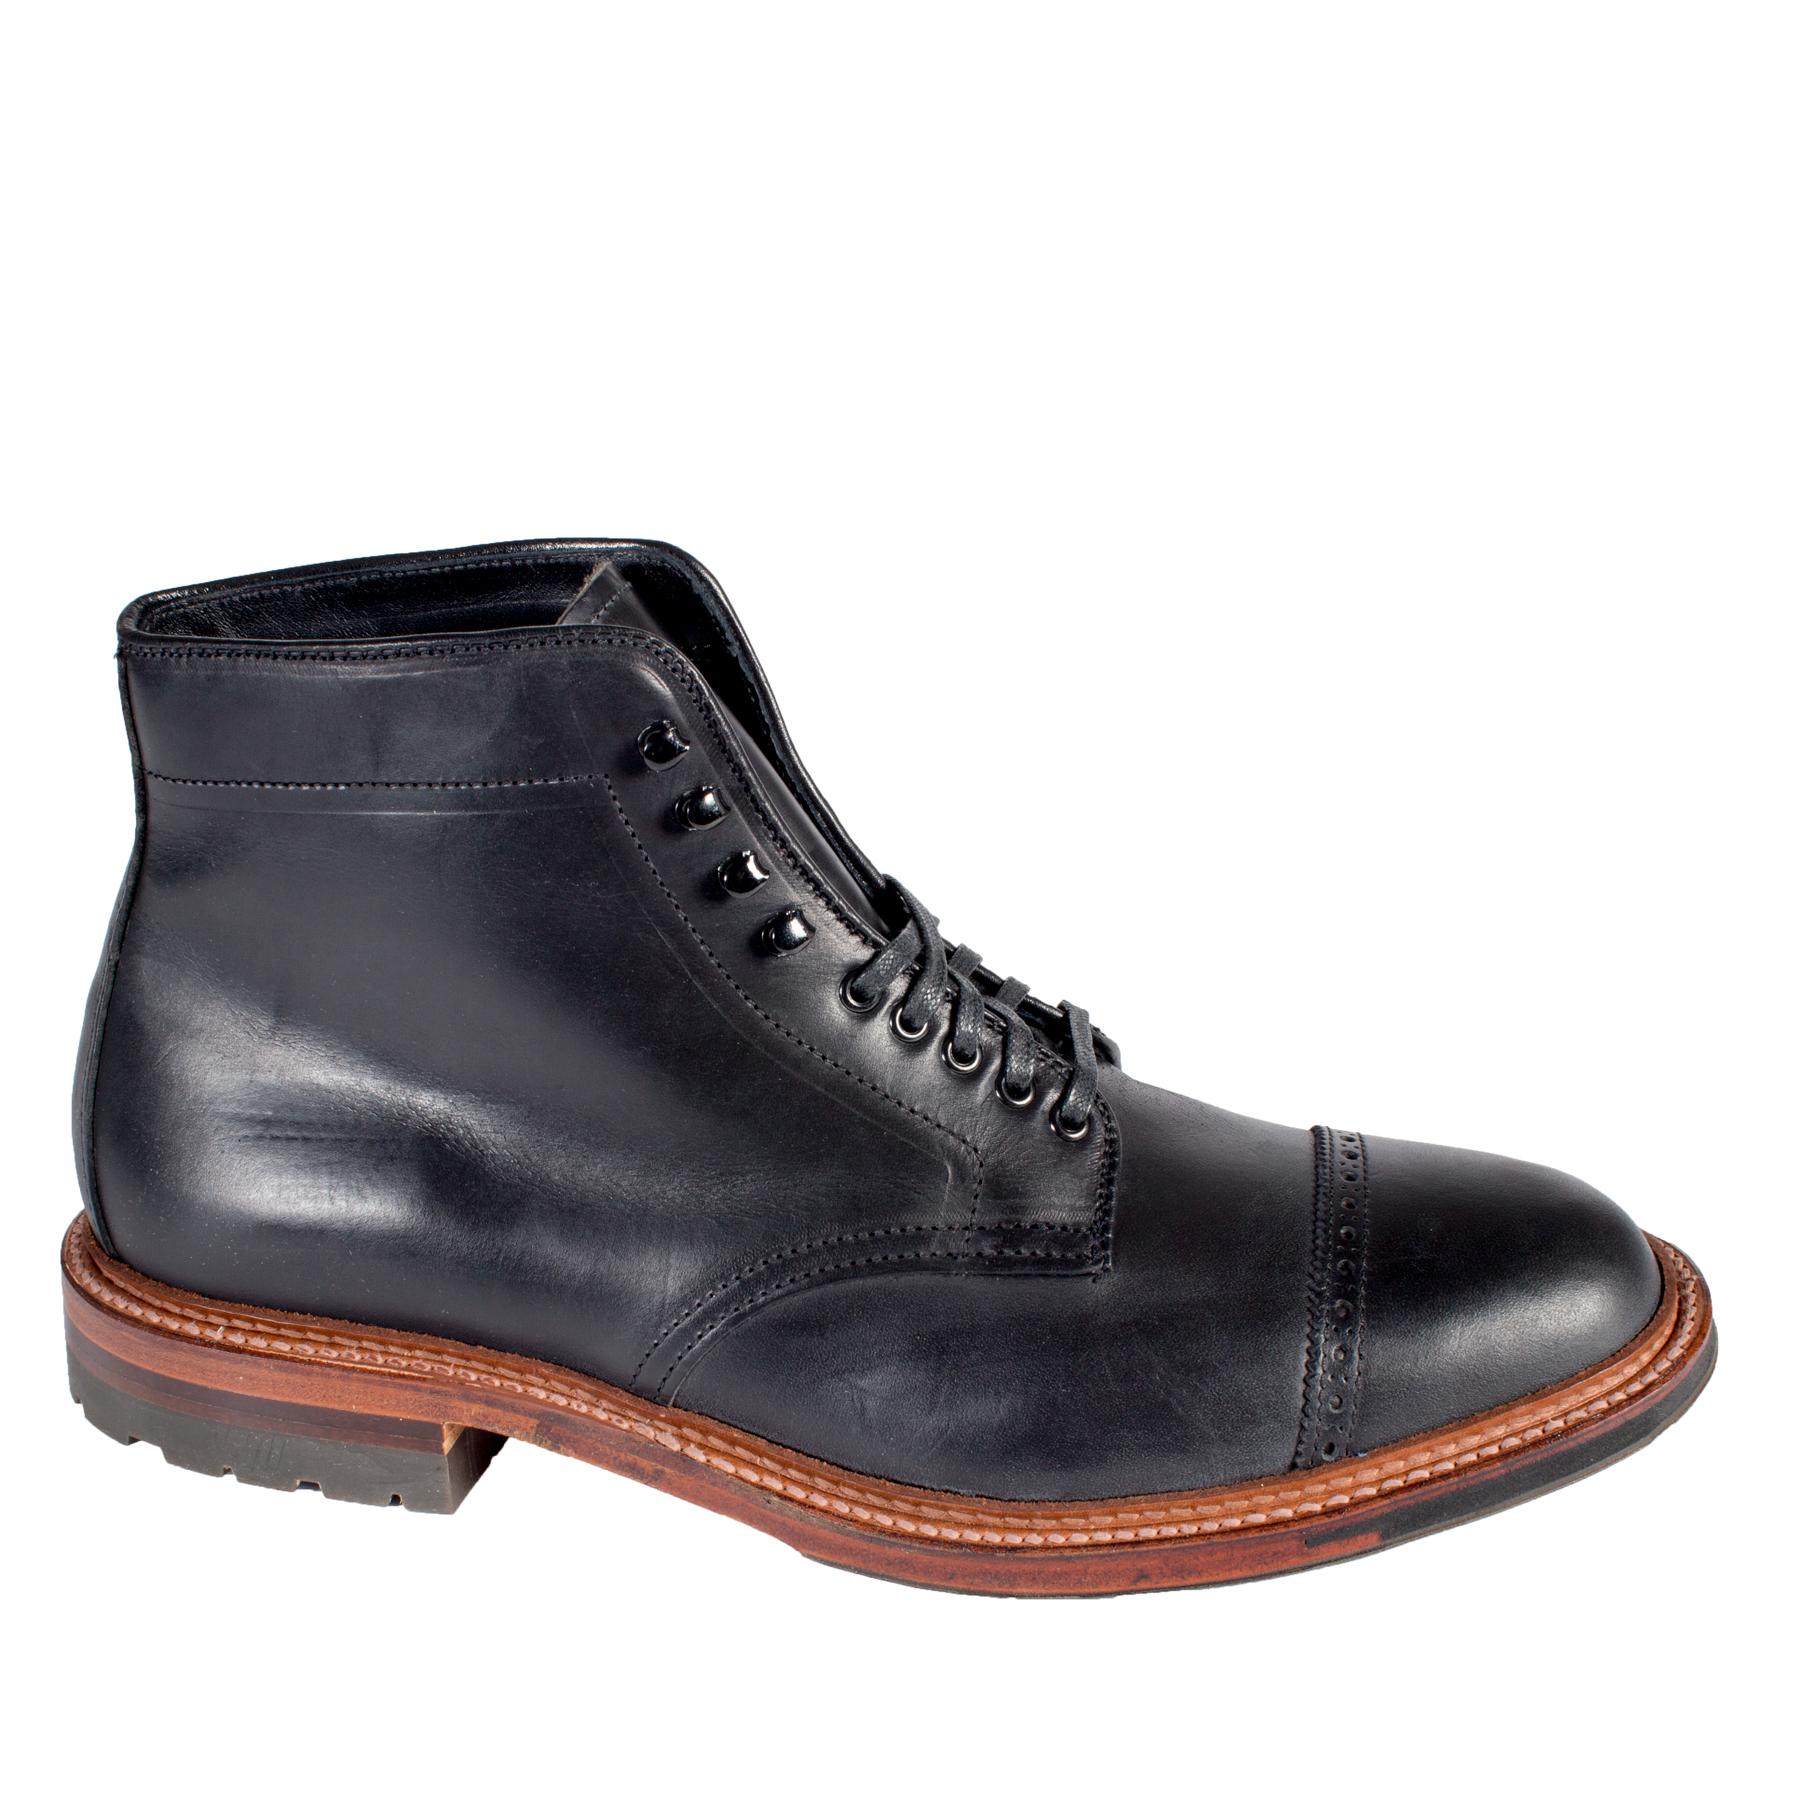 jumper boot black chromexcel